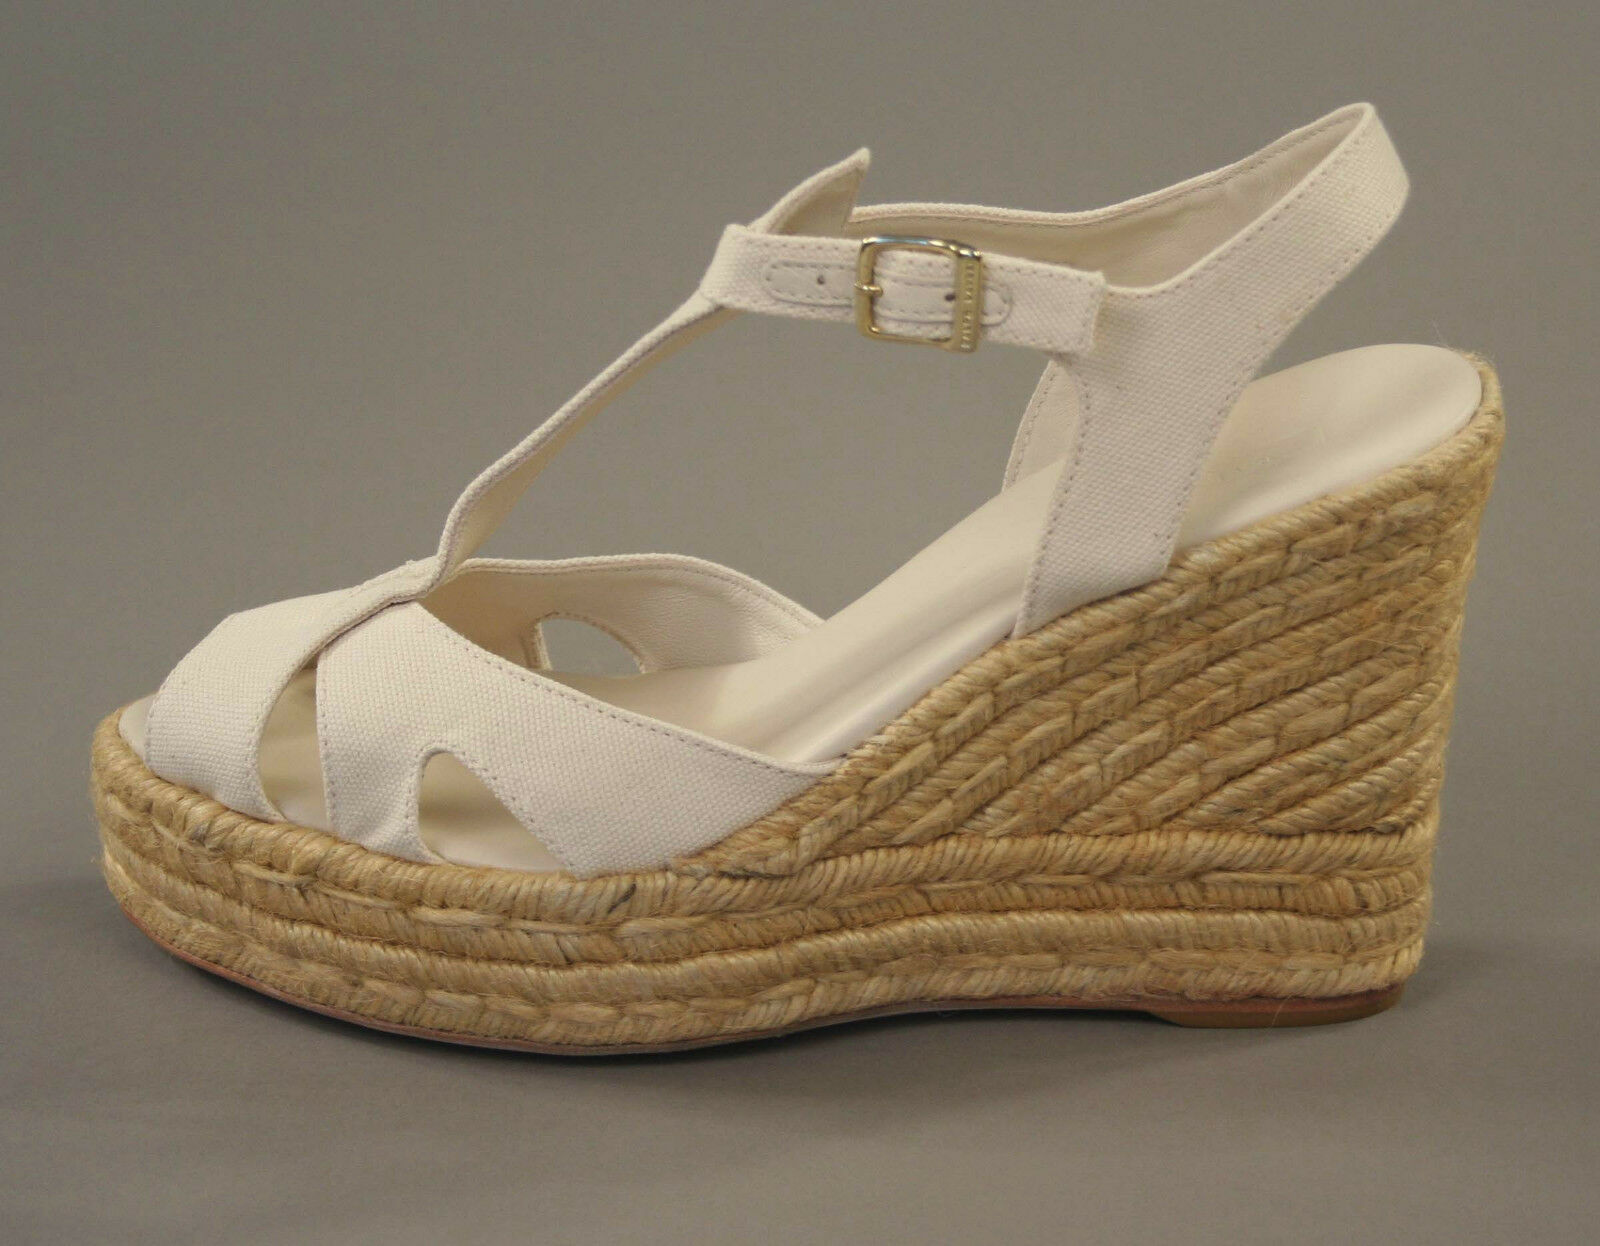 Ralph Lauren lila Label Label Label Espadrille Schuhe 10.5 Neu Kaufen 22589e